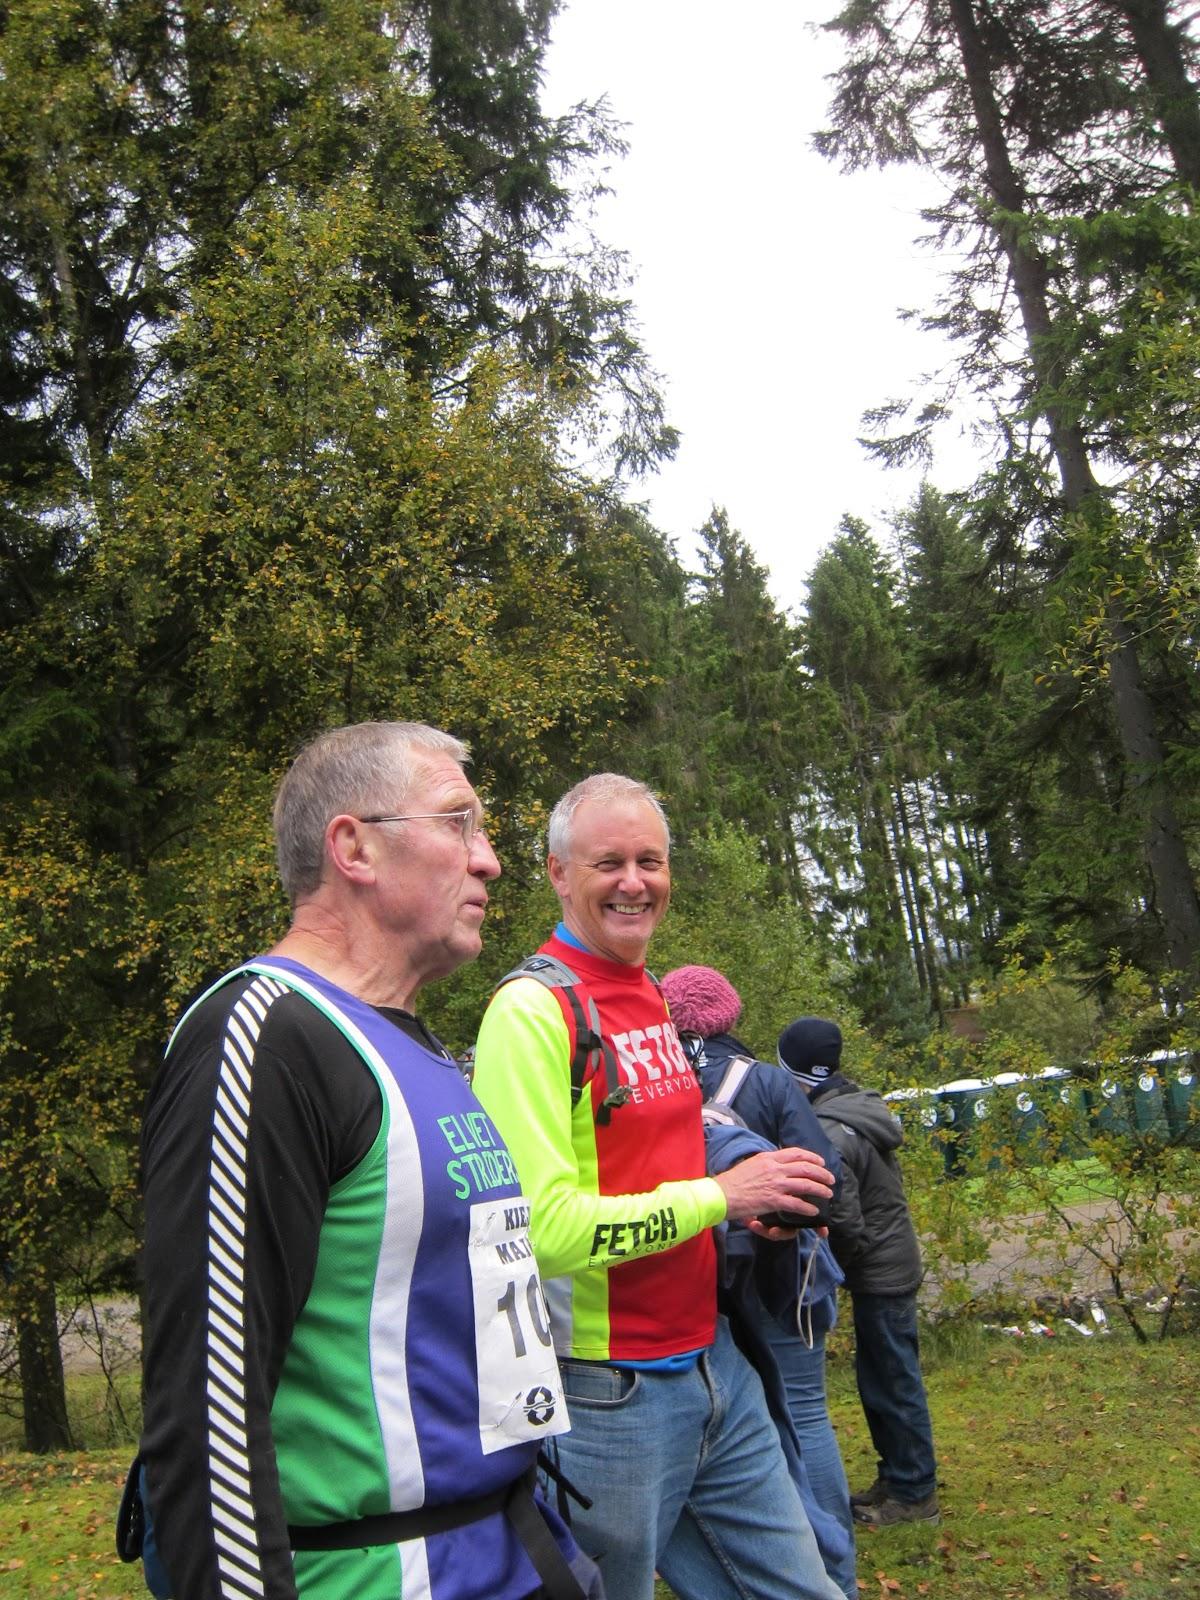 Kielder -- Dave Robson -- Alan Purvis -- Kielder Marathon - 2010 -- Alan Purvis - Elvet Striders -- Dave Robson - Elvet Striders -- (United Kingdom - England - Falstone - Falstone) -- Sun 17 Oct 2010 09-02-42 BST.jpg